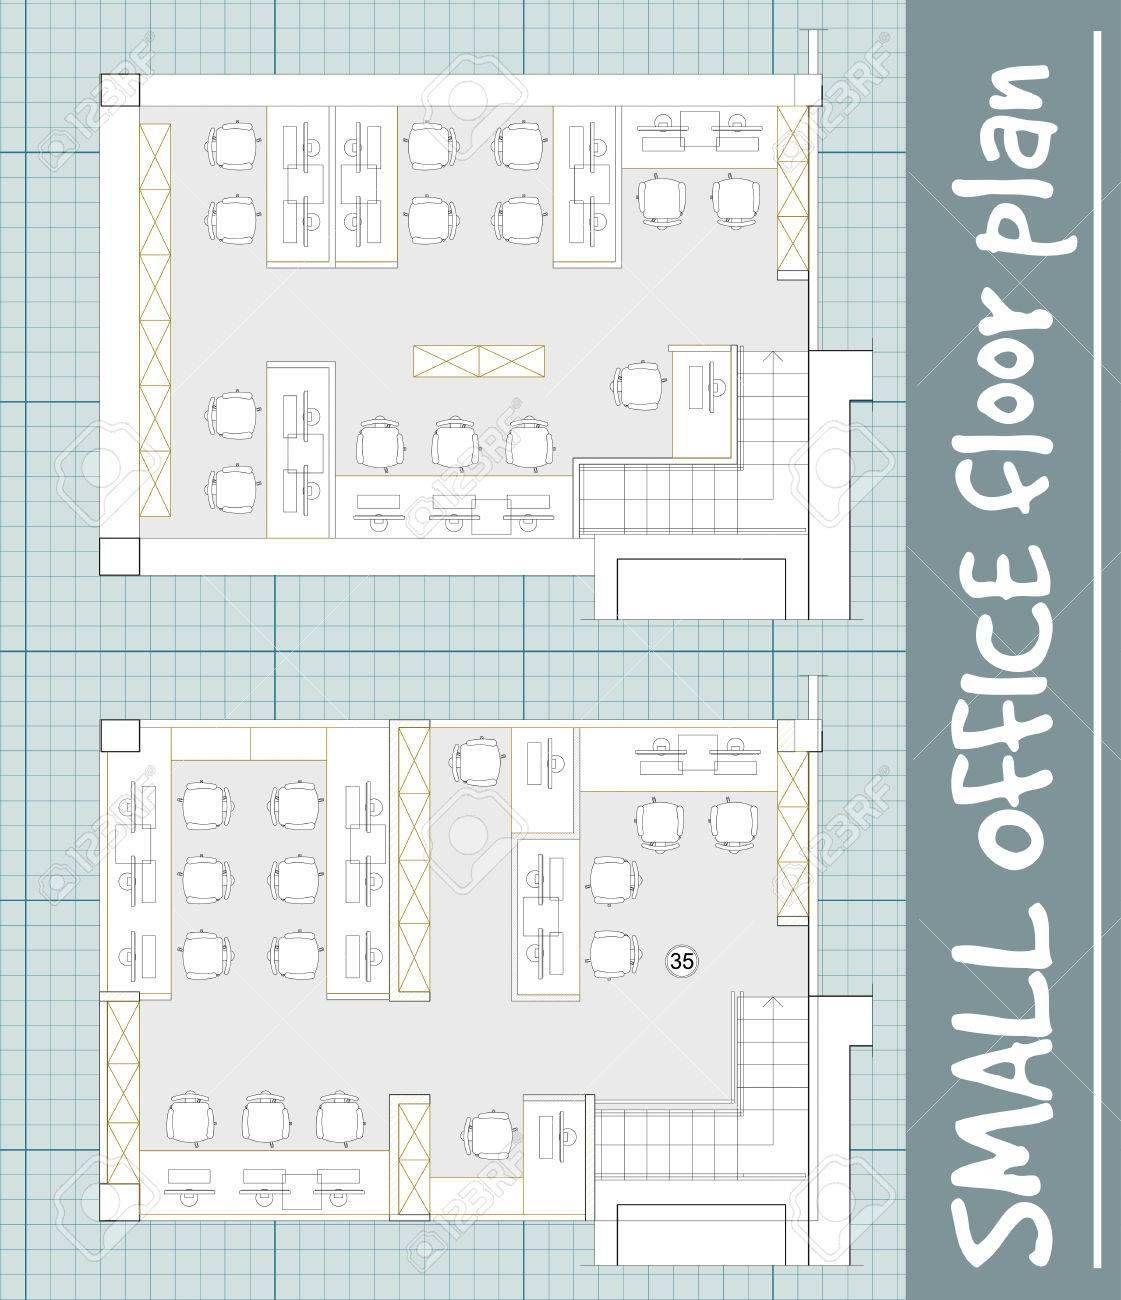 Office Furniture Planning Call Center Office Standard